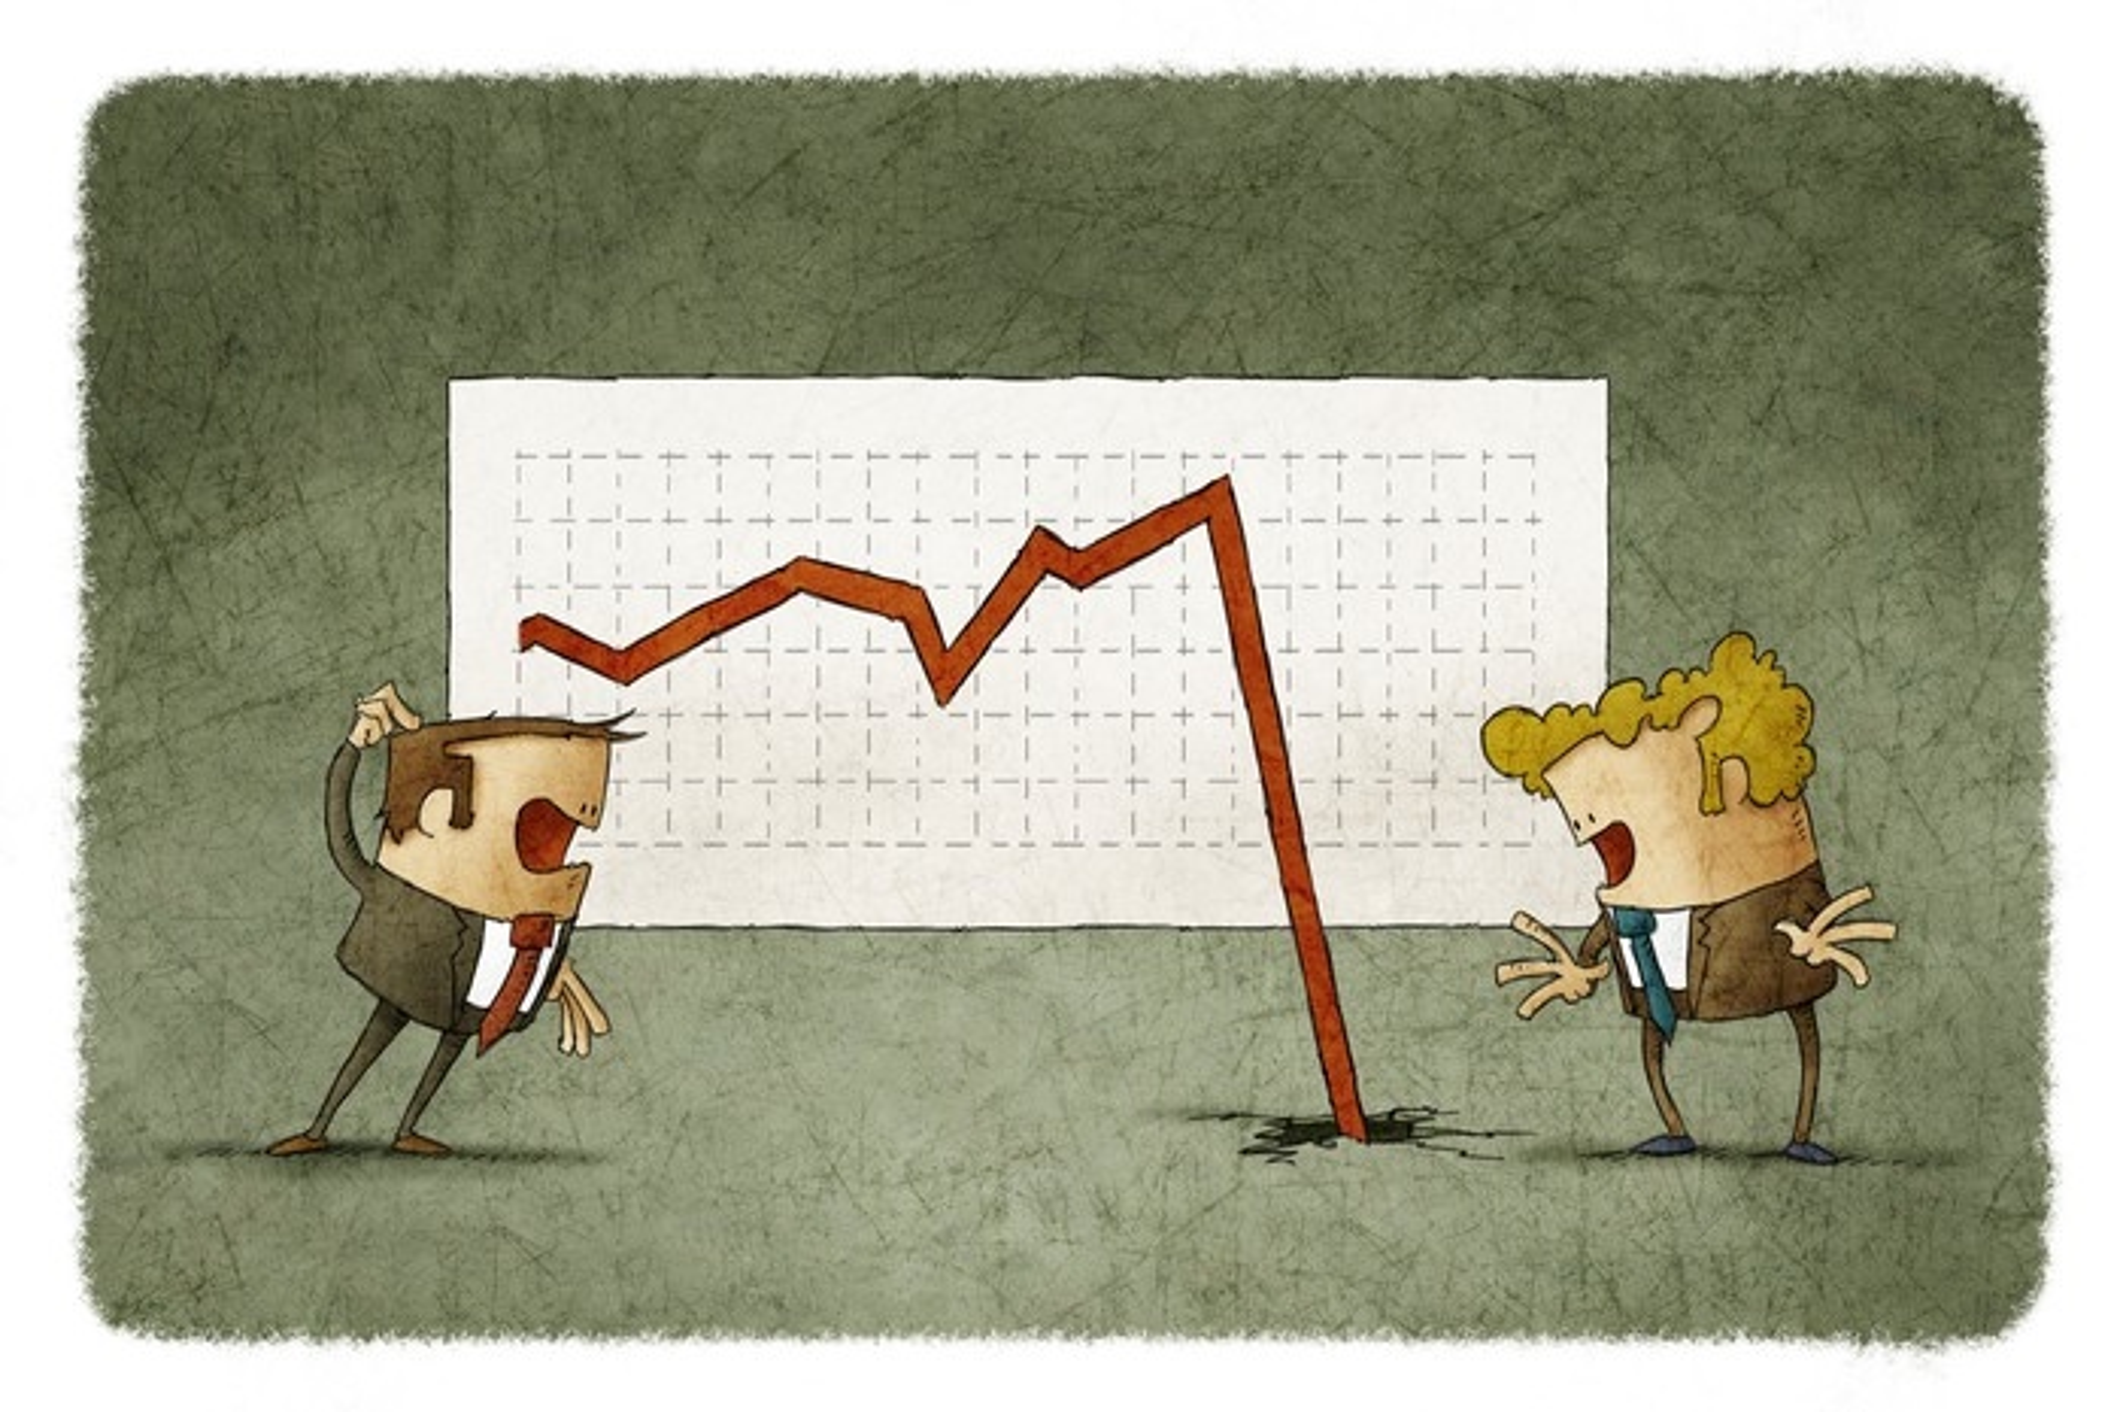 Cartoon characters watch stock chart fall through a floor